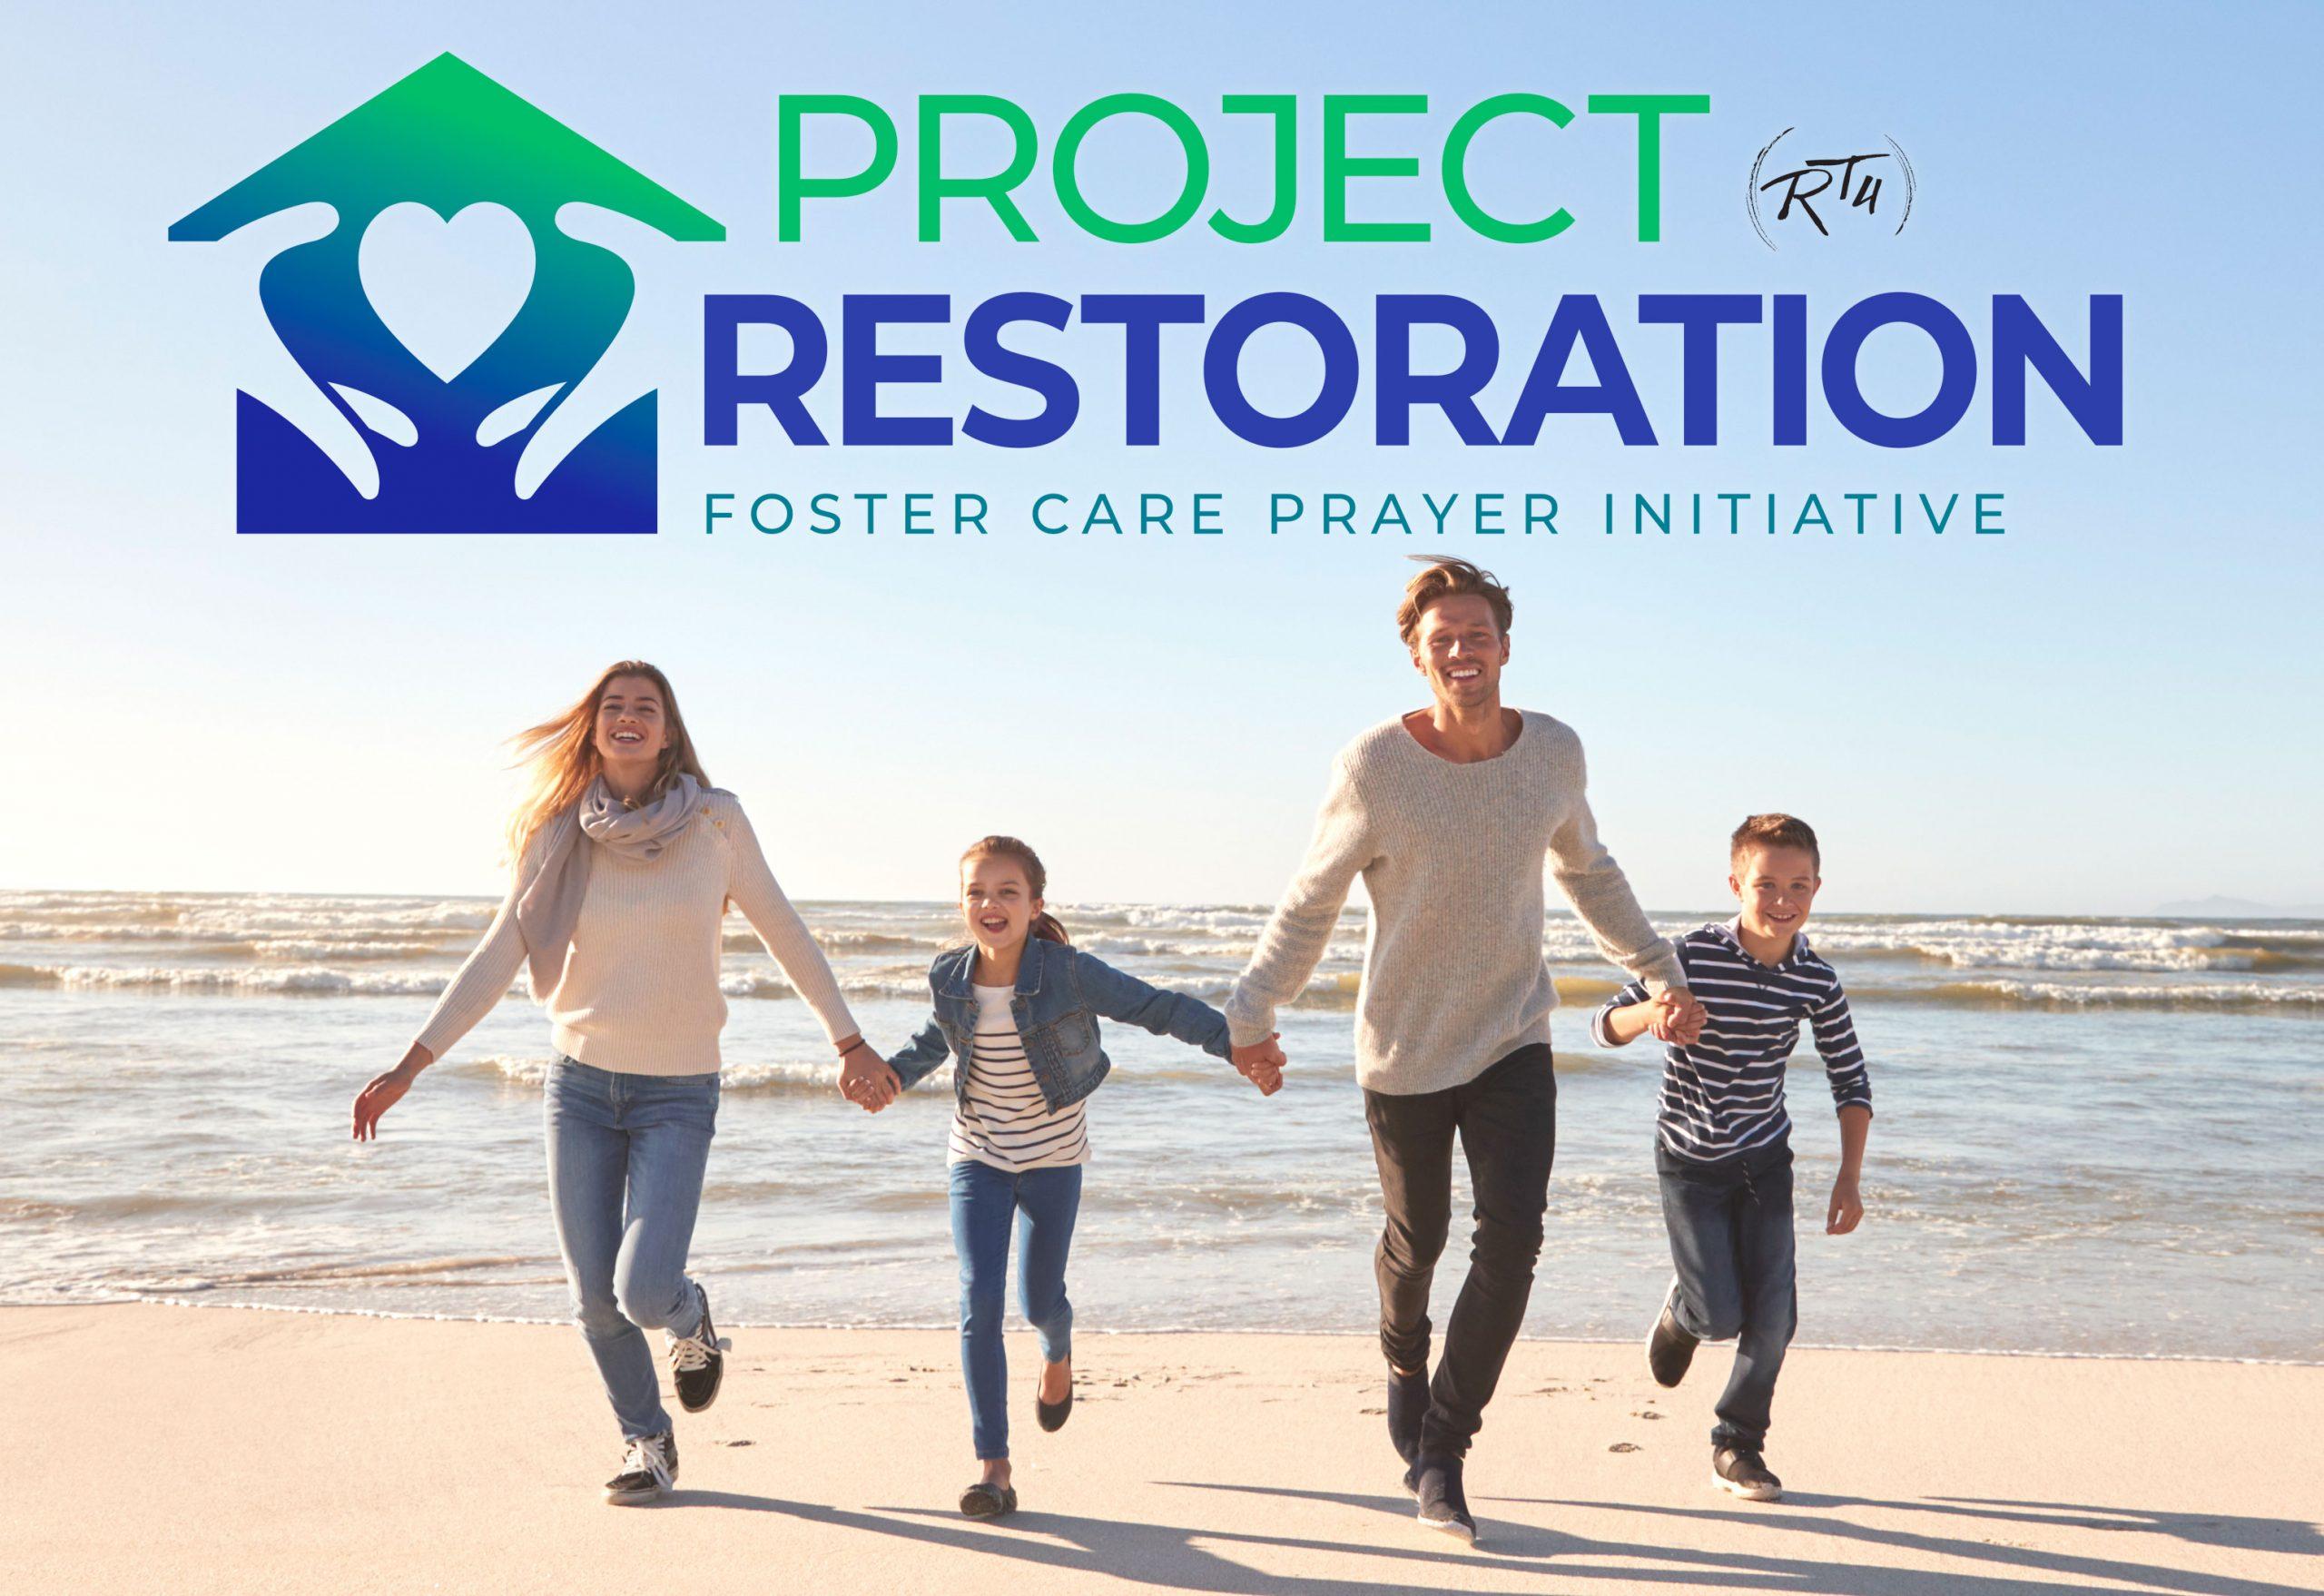 Project Restoration Foster Care Initiative (Georgia with Ravi Kandal)